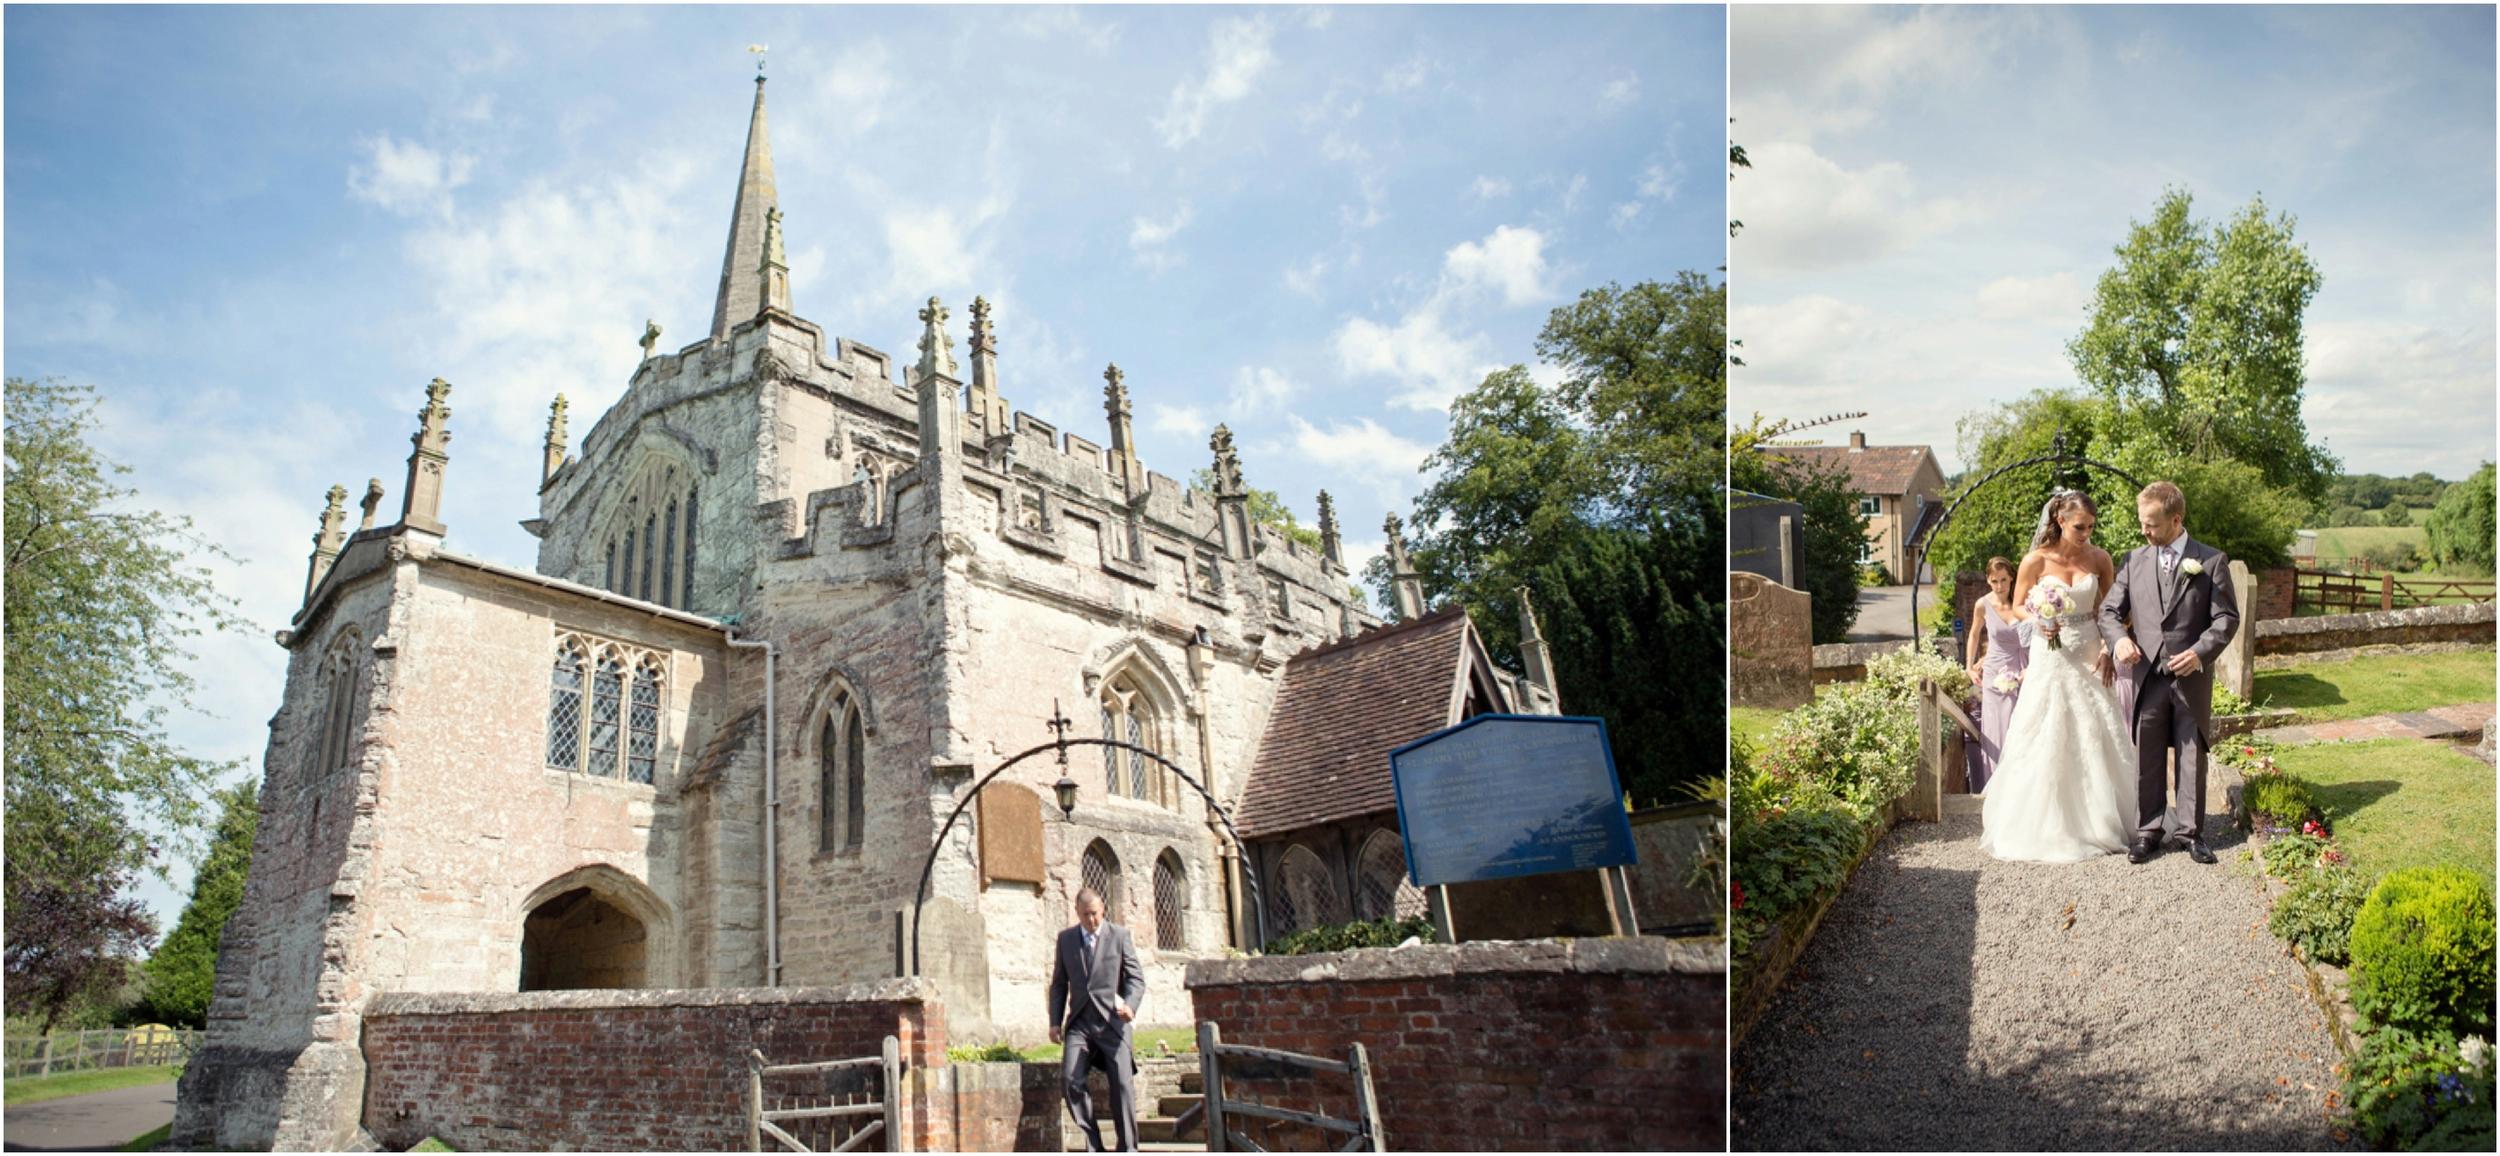 Sophie Evans Photography, Warwickshire Wedding Photography, Welcombe Hotel  (21).jpg